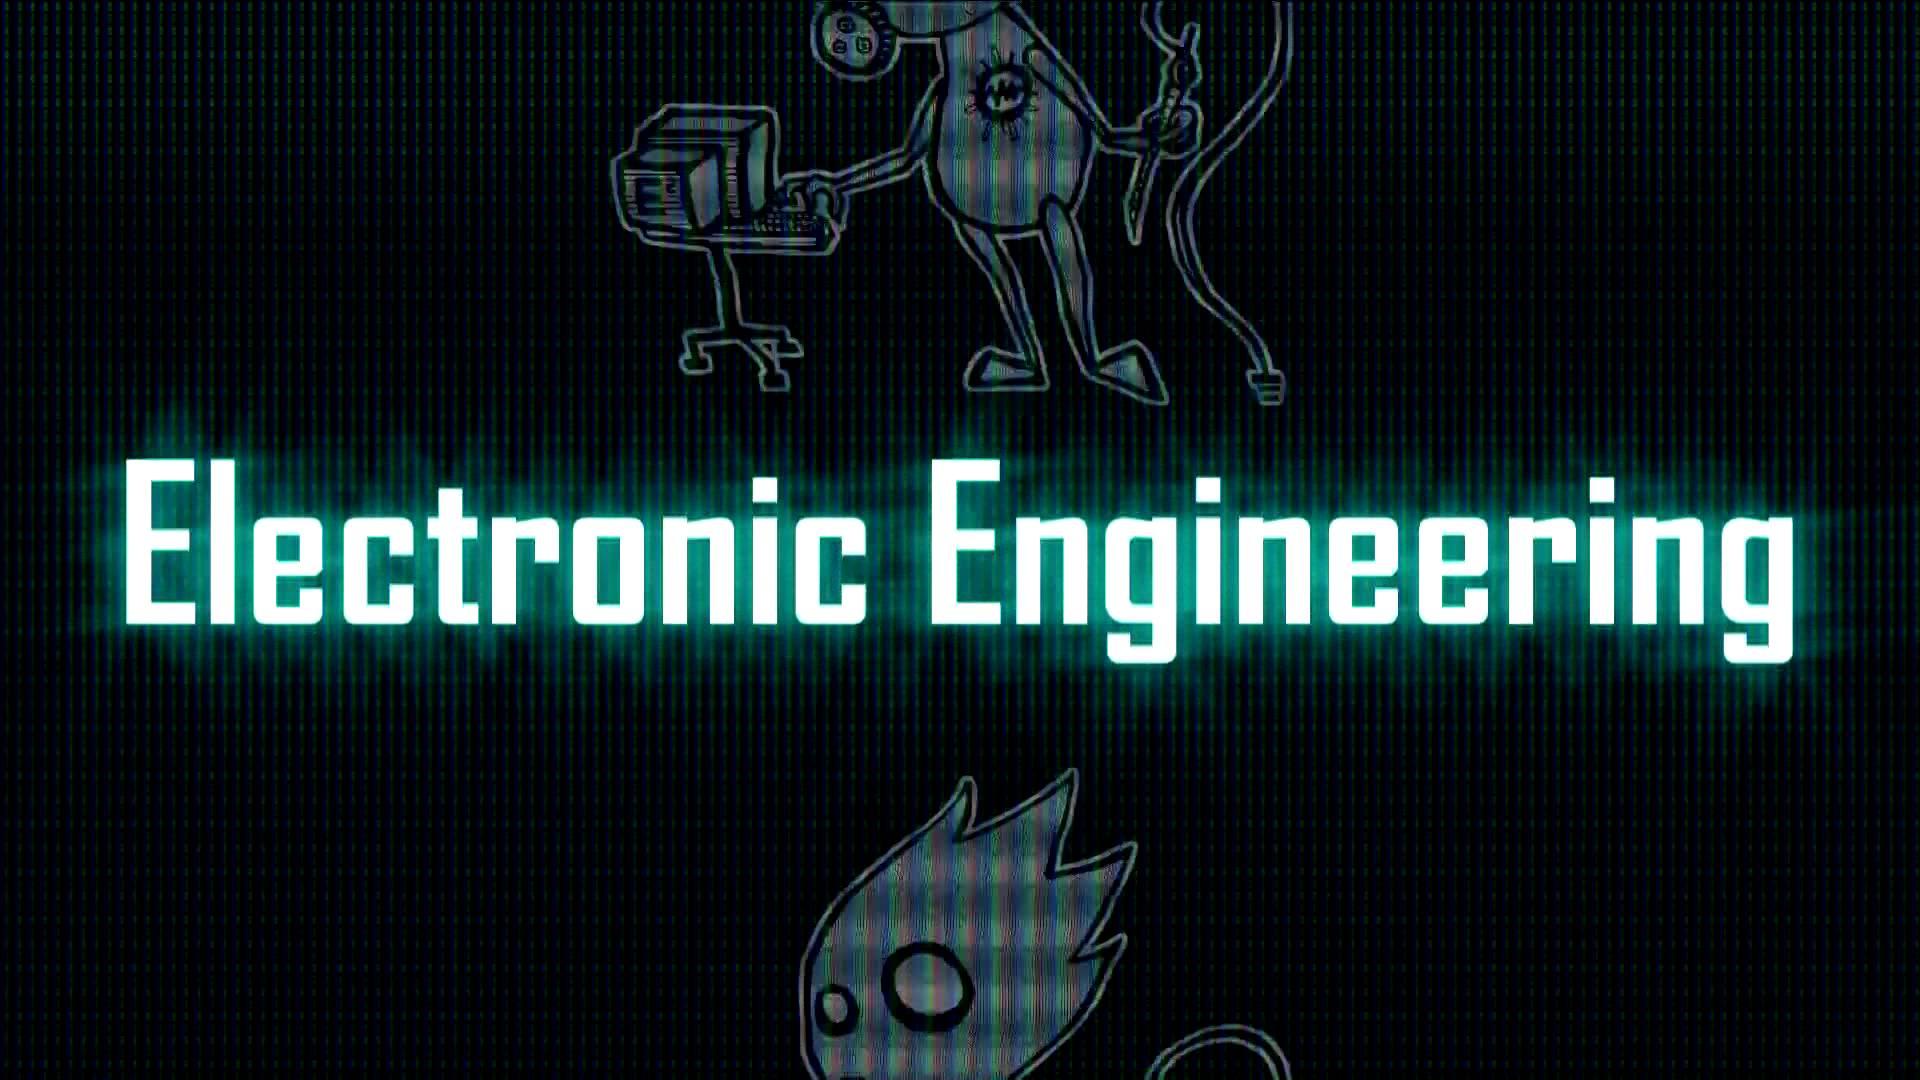 Electronics Engineering vs Electronics Communication 1920x1080